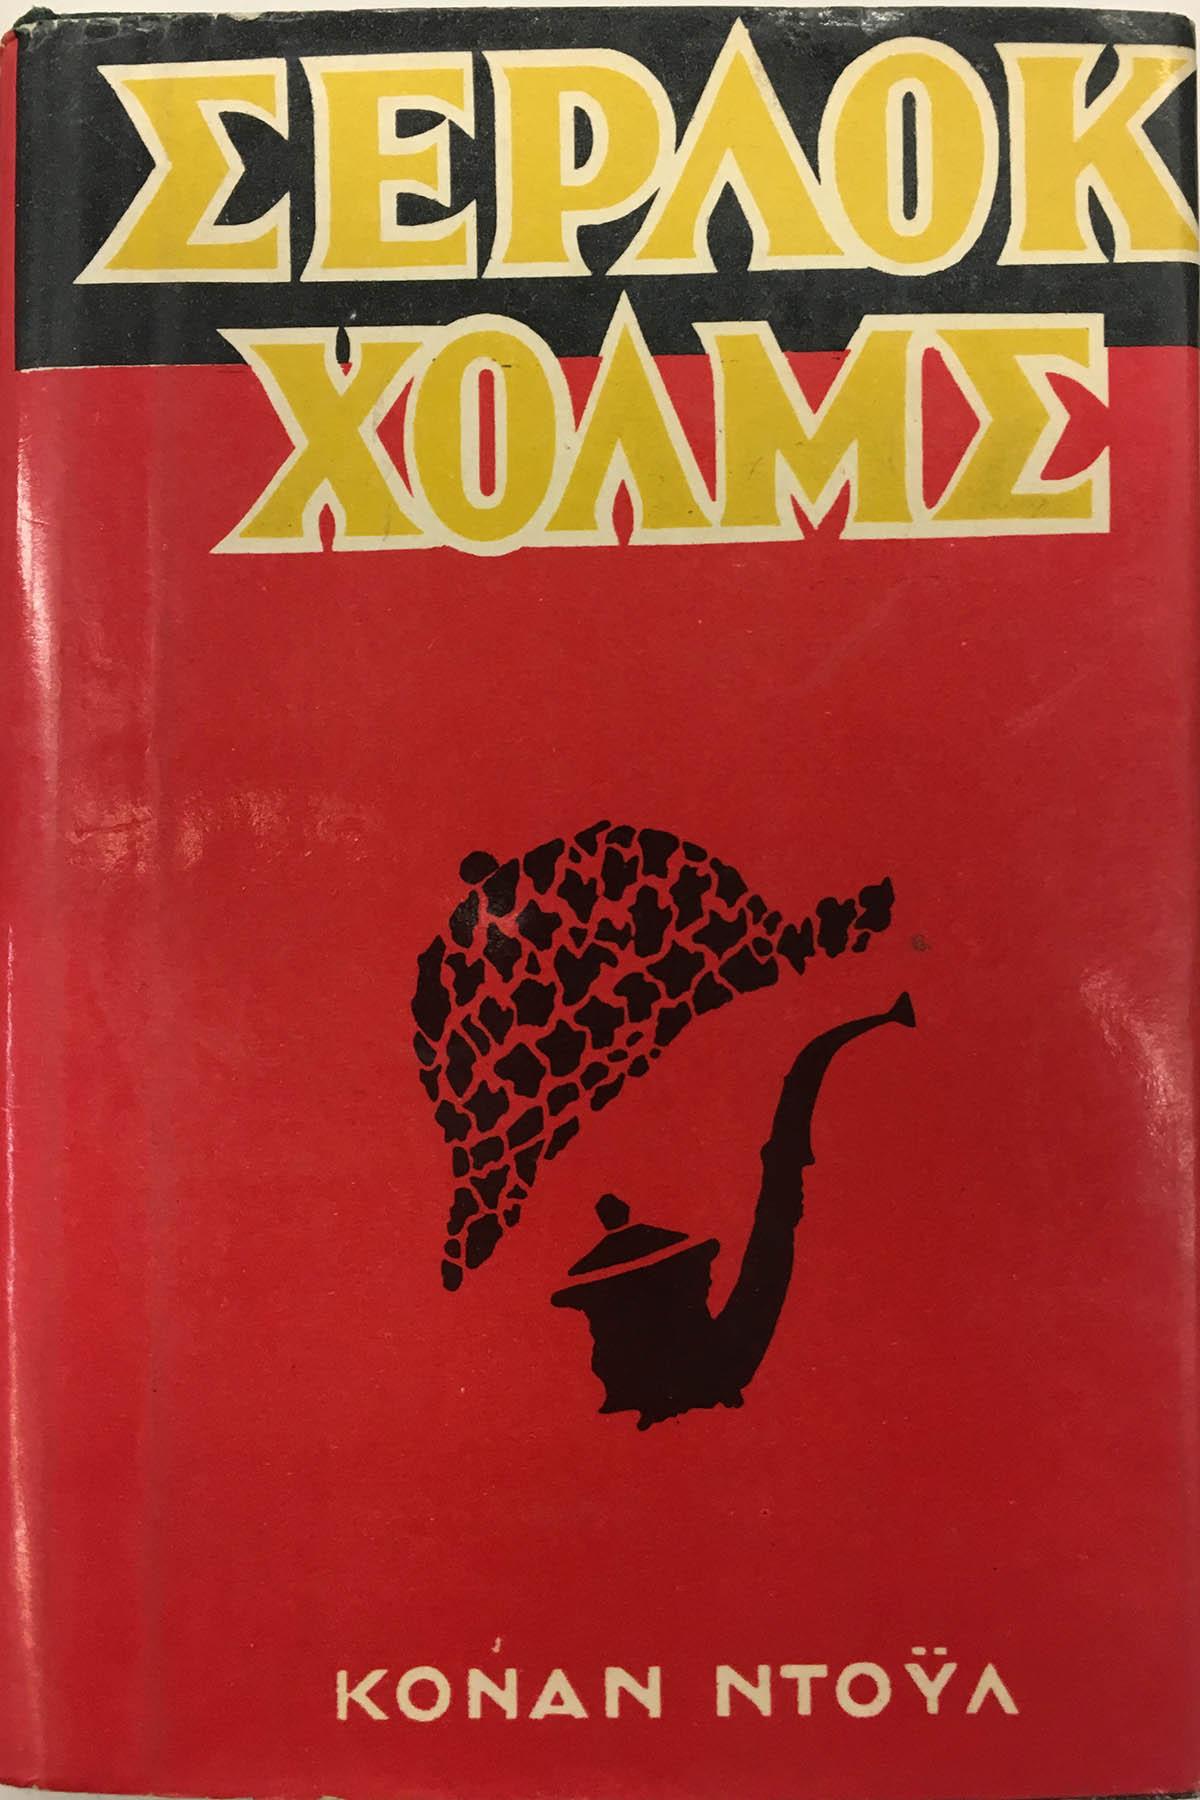 Doyle, Arthur Conan. Sherlock Holmes, translated by unknown. Athens: B. Damianakau & Co.